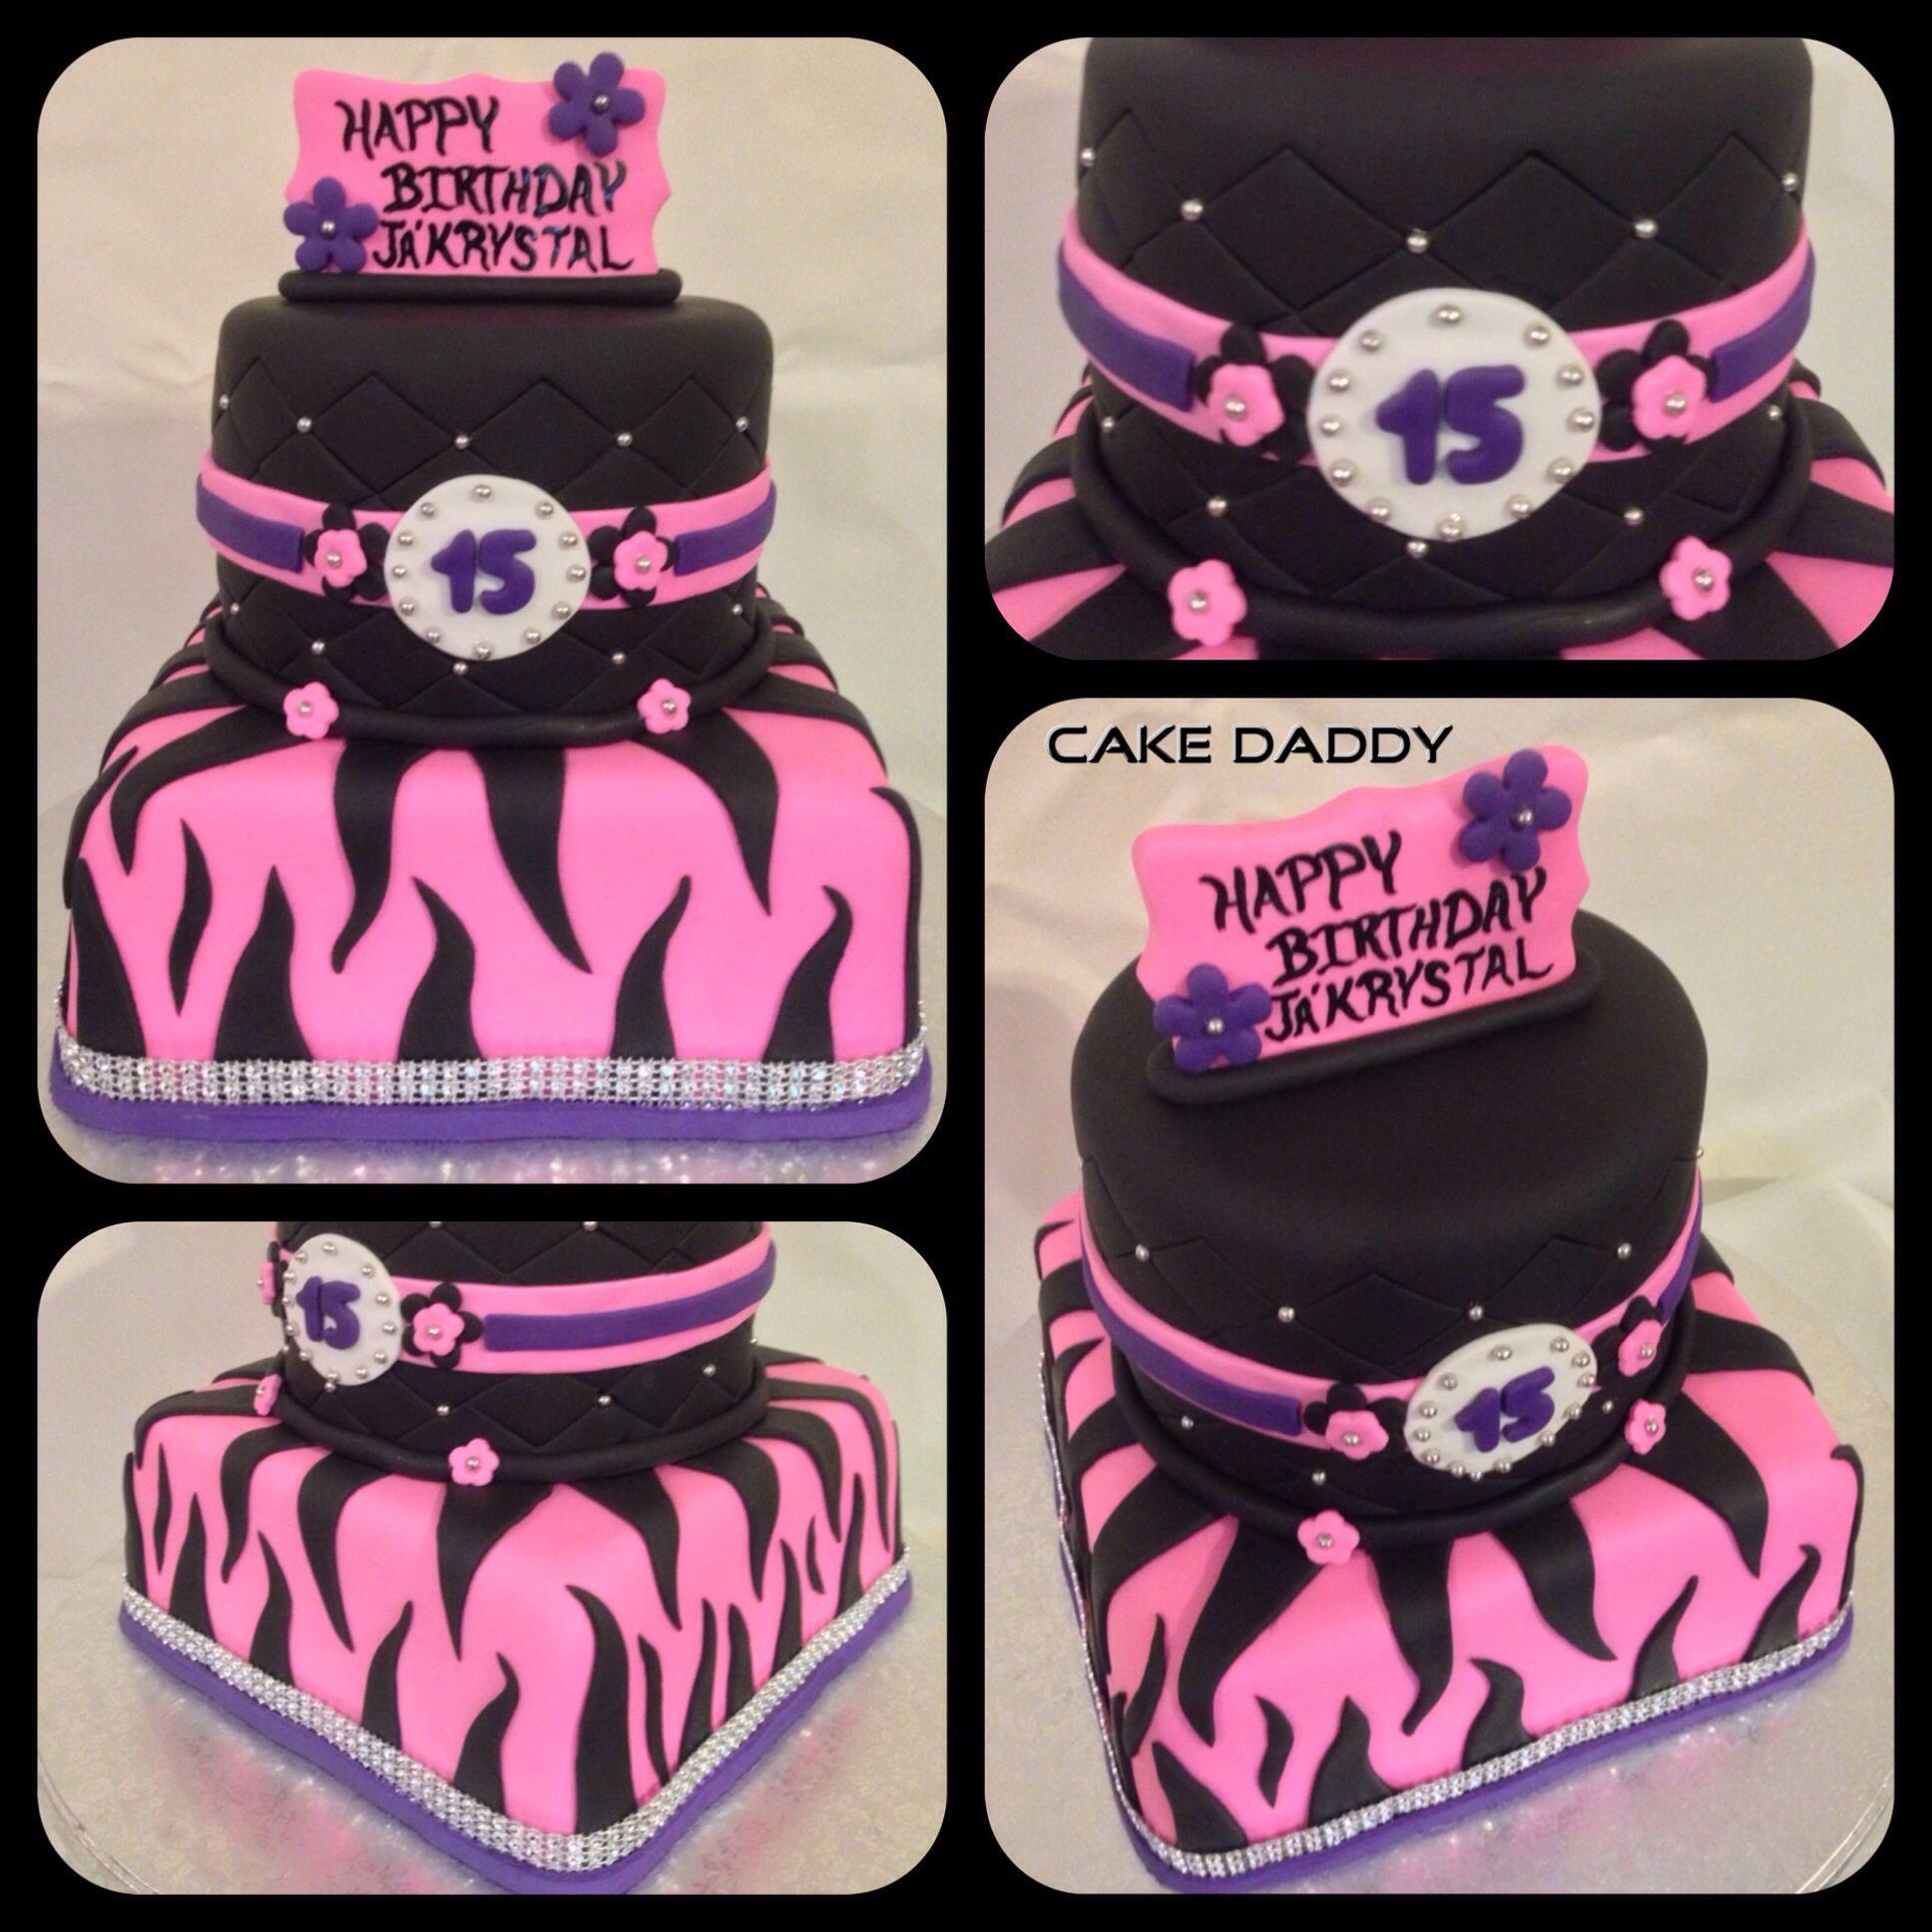 Strange Pink Purple And Black Zebra Print Birthday Cake With Images Personalised Birthday Cards Veneteletsinfo